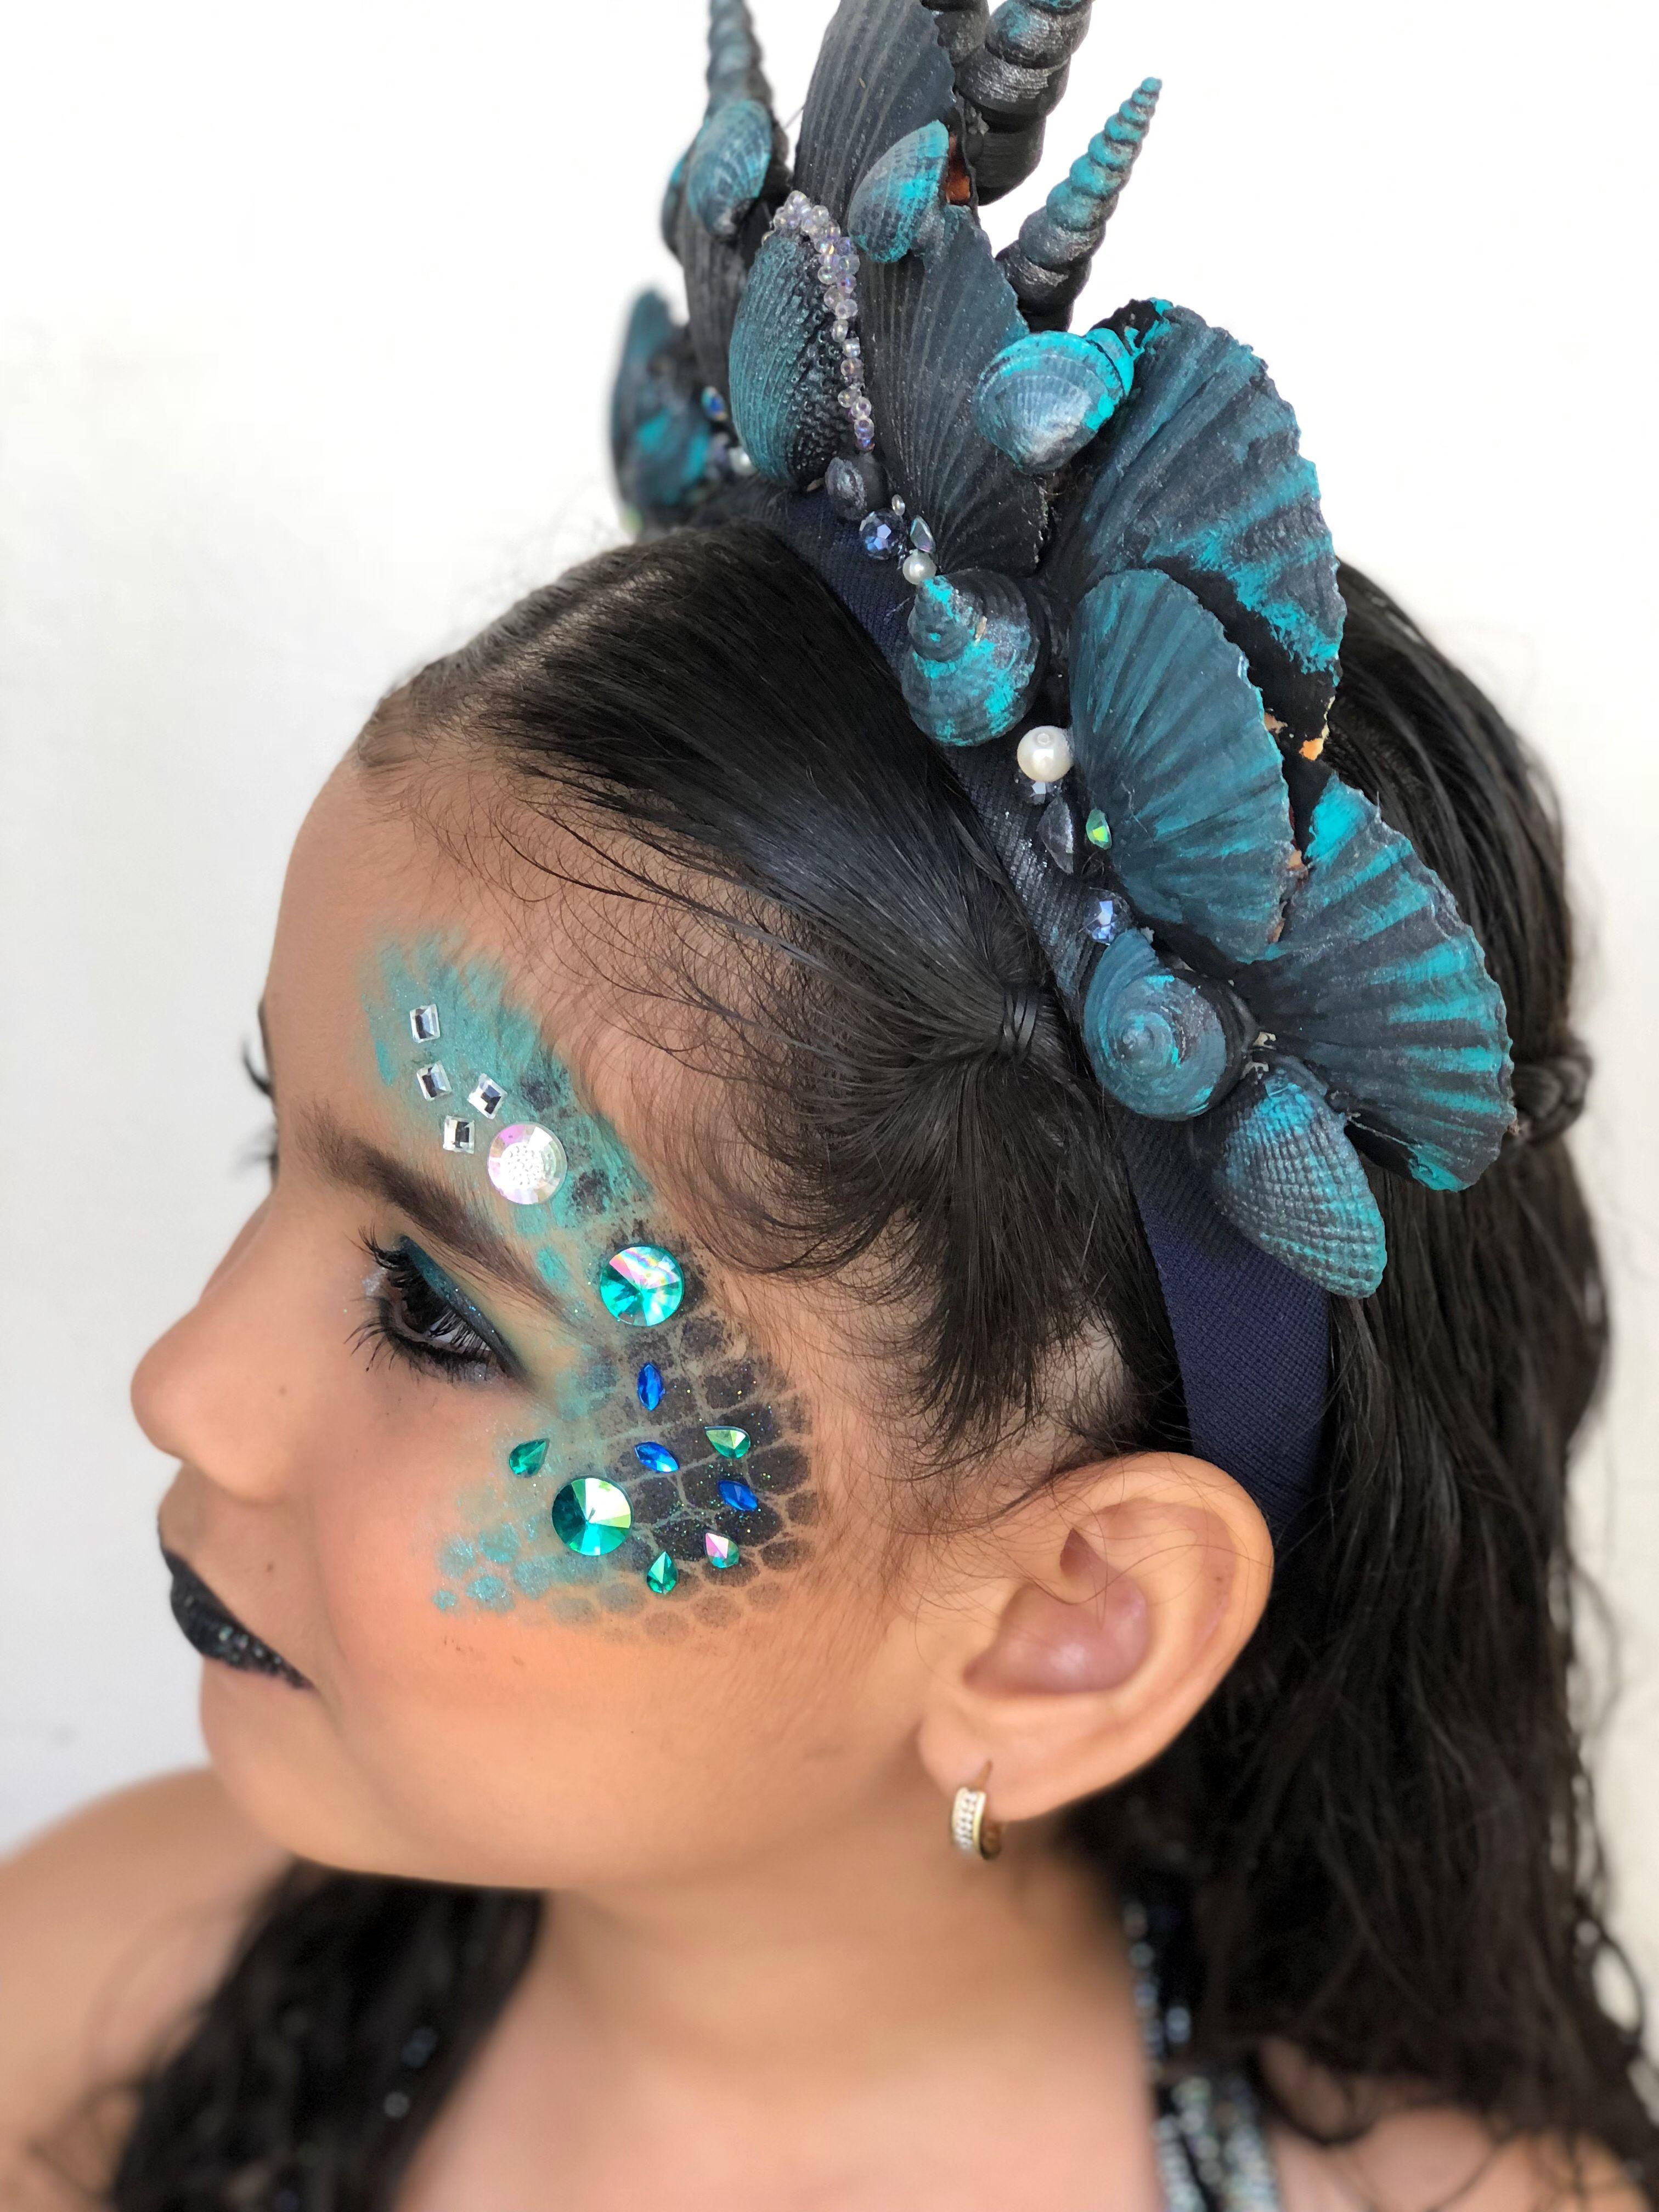 Deguisement Sirene Fille Costume De Sirene Diy Maquillage Et Coiffure Deguisement La In 2020 Mermaid Makeup Halloween Girls Mermaid Costume Mermaid Costume Diy